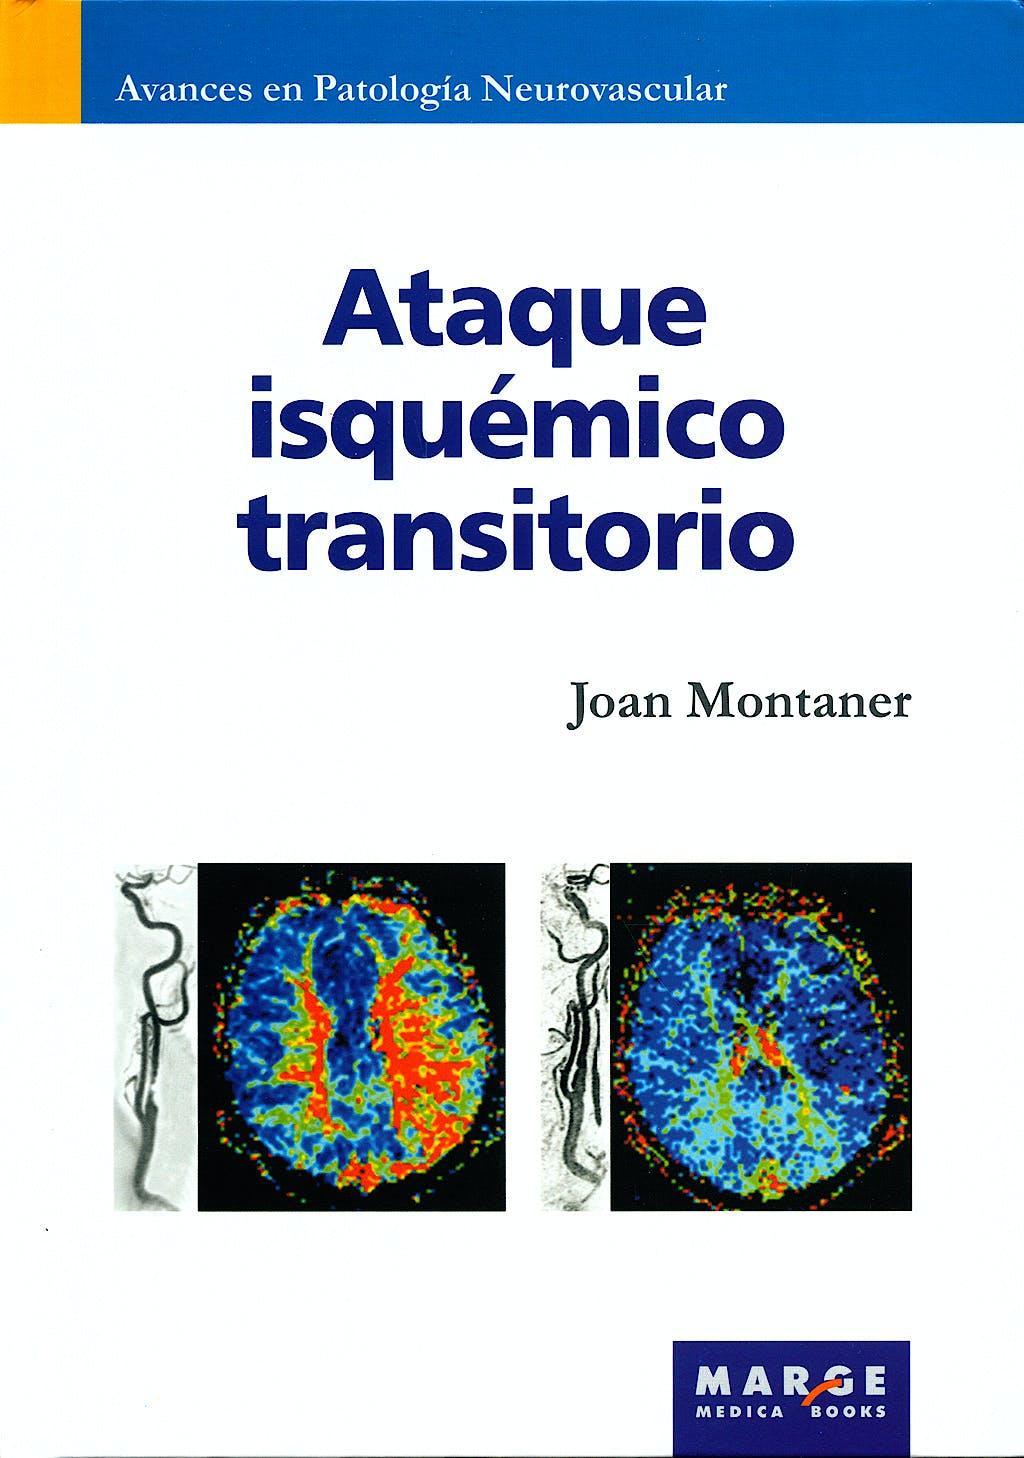 Portada del libro 9788492442485 Ataque Isquemico Transitorio (Avances en Patologia Neurovascular, Vol. 5)